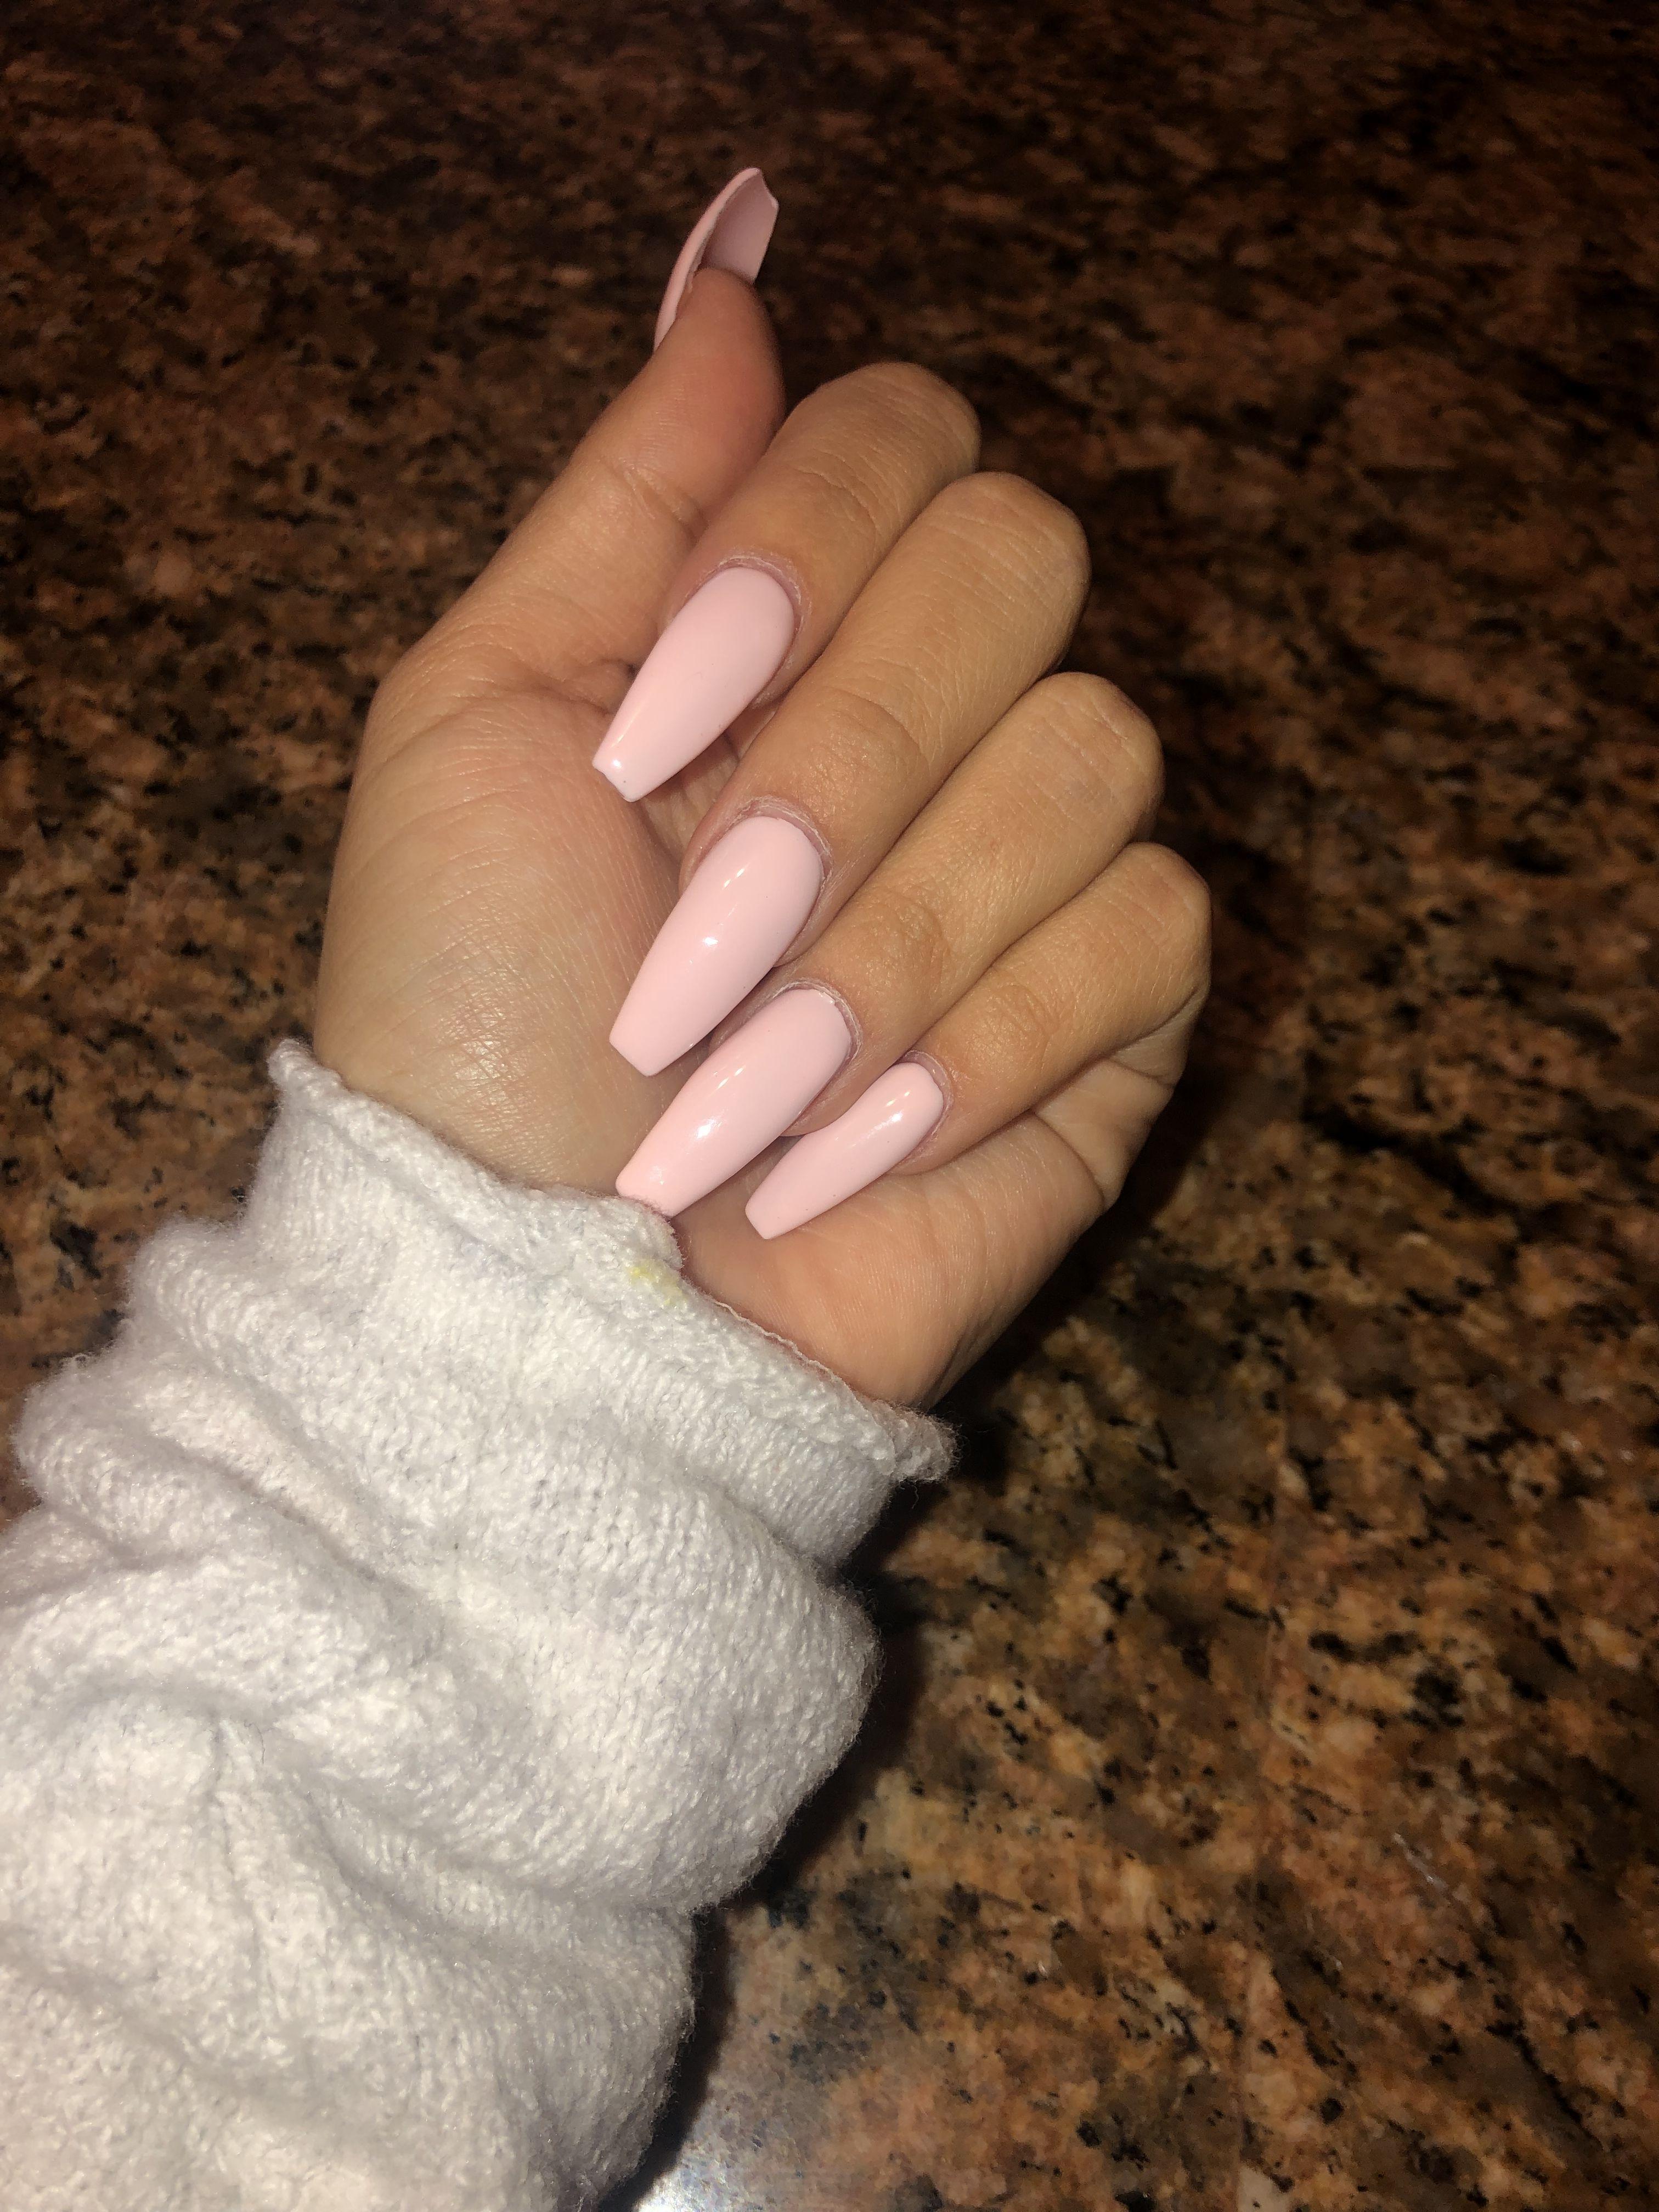 Elegant Pink Nails Acrylic Acrylicnails Longnails Pink Summernailsgel Baby Pink Nails Pink Acrylic Nails Baby Pink Nails Acrylic